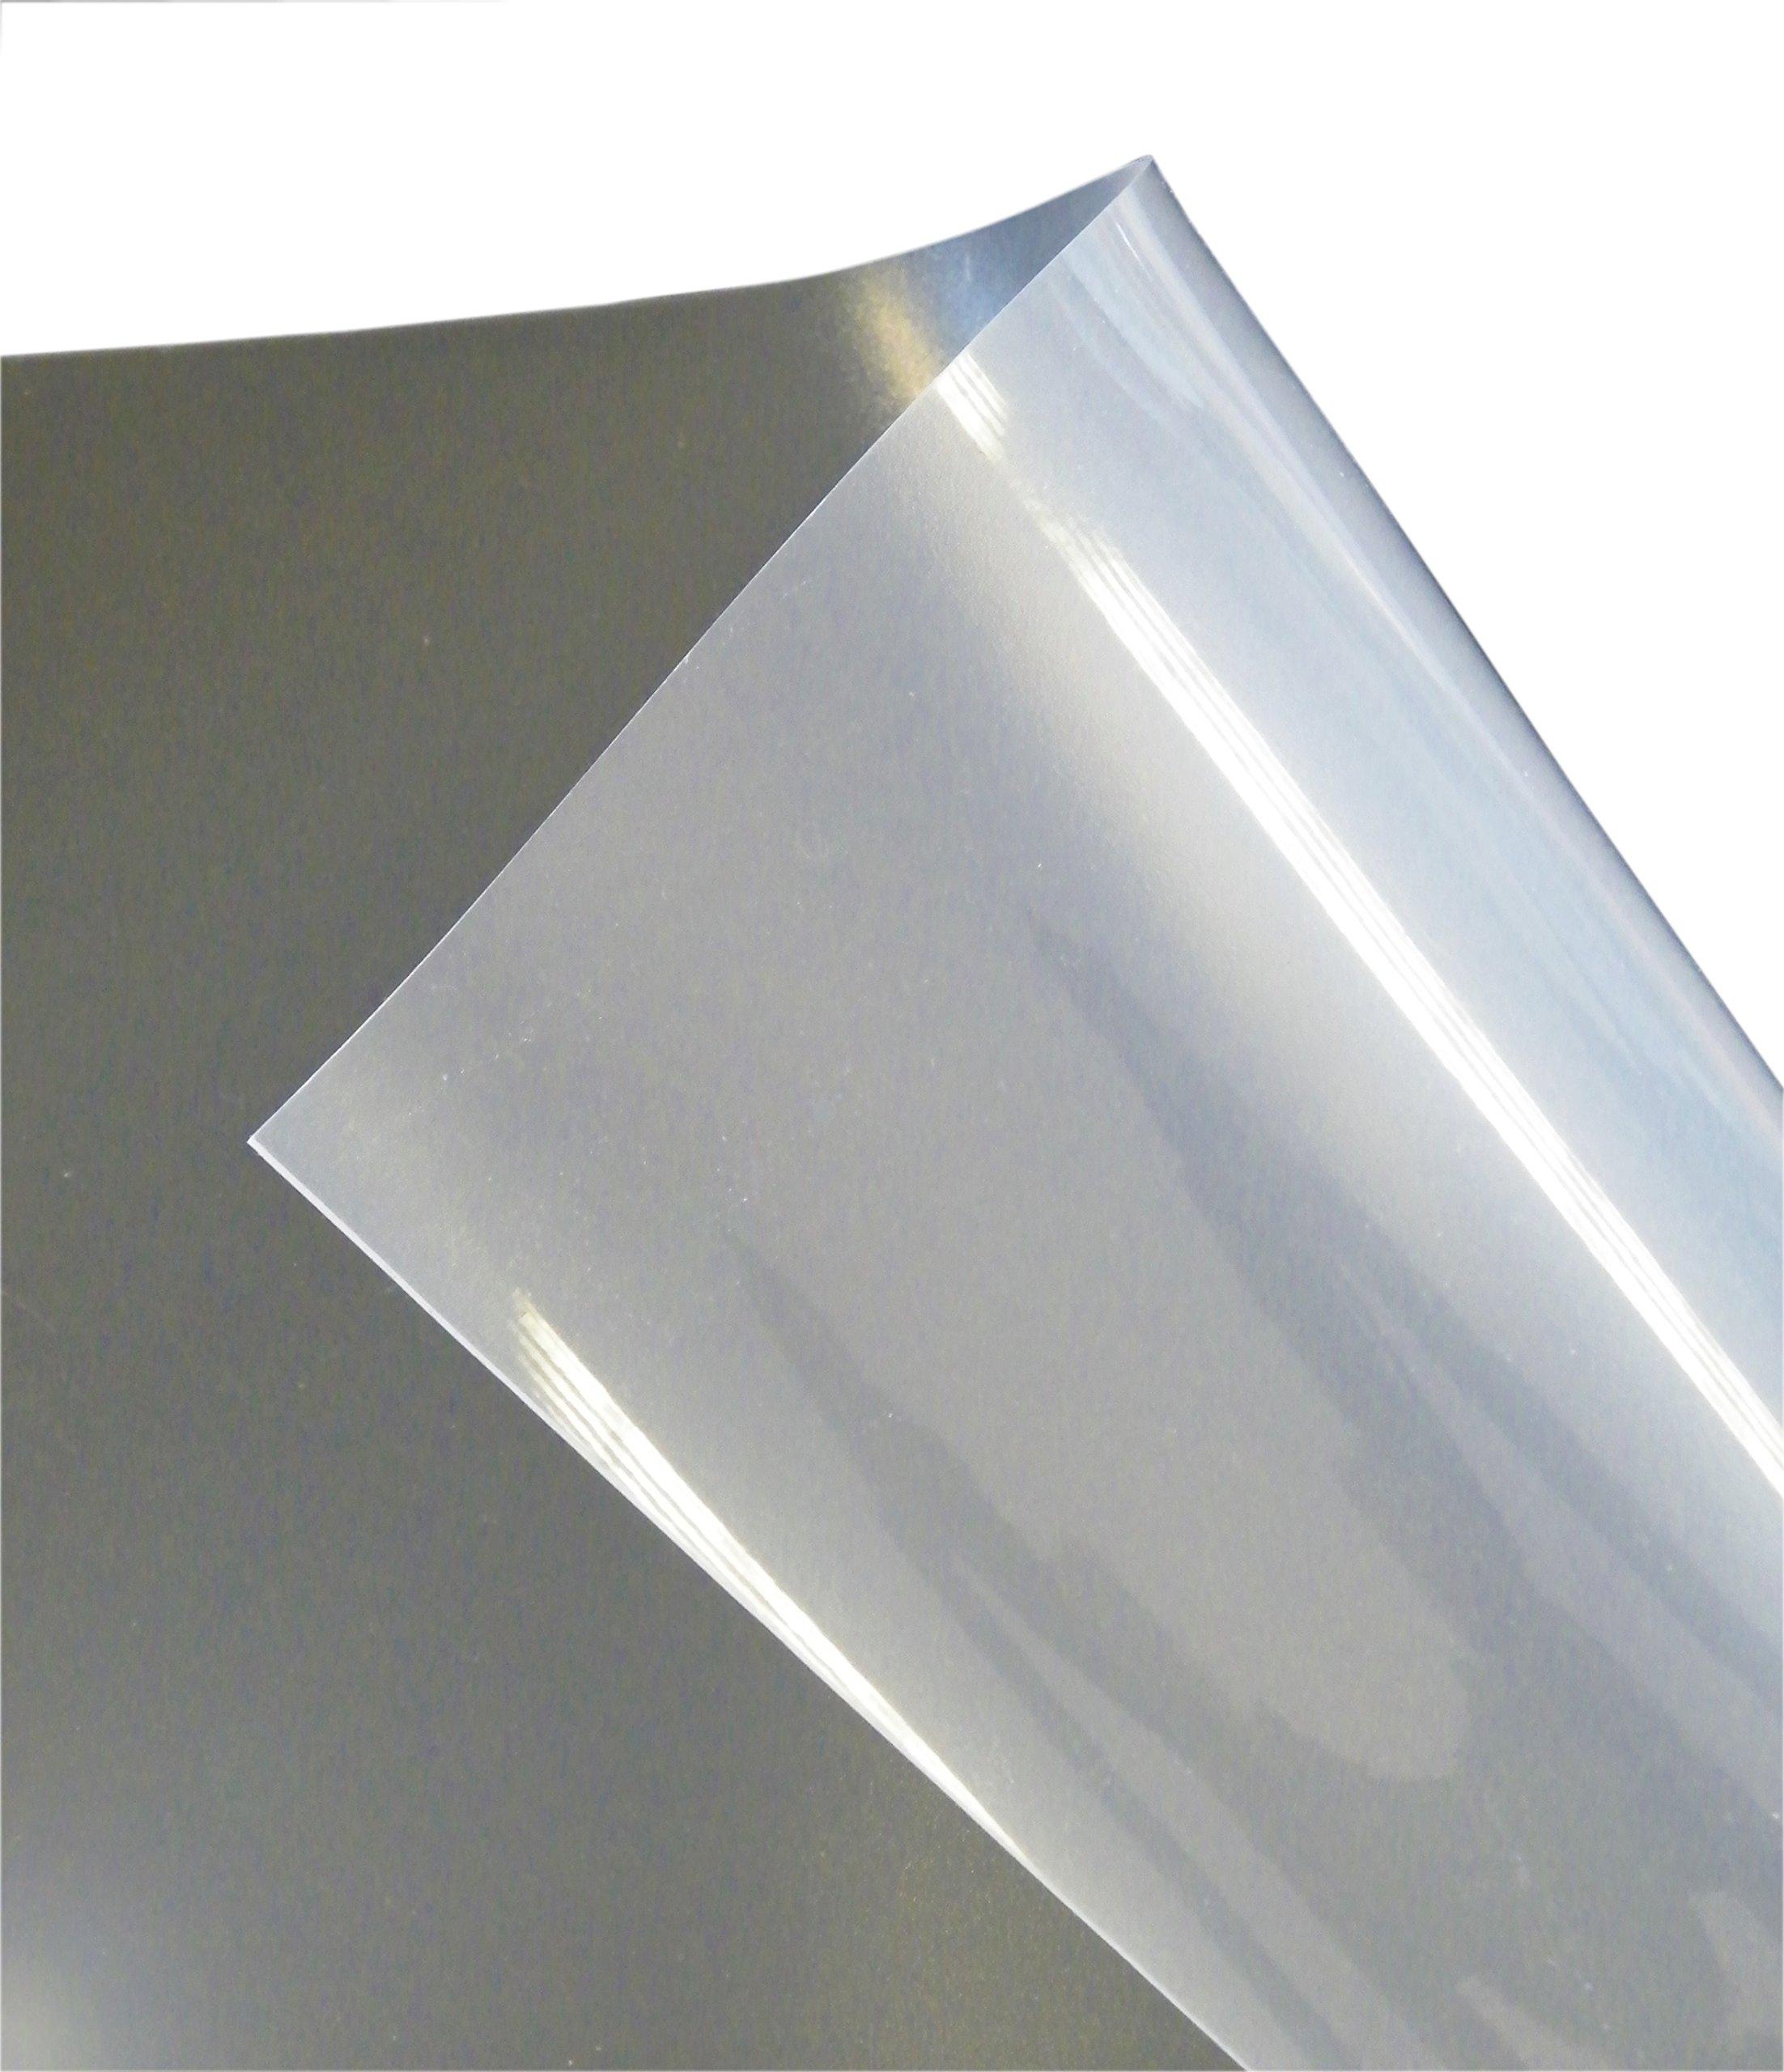 Floortex Long & Strong Hallway Runner, for Hard Floors, Clear PVC Floor Protector Roll Mat, Size 48'' x 18ft (FRR124818EV)